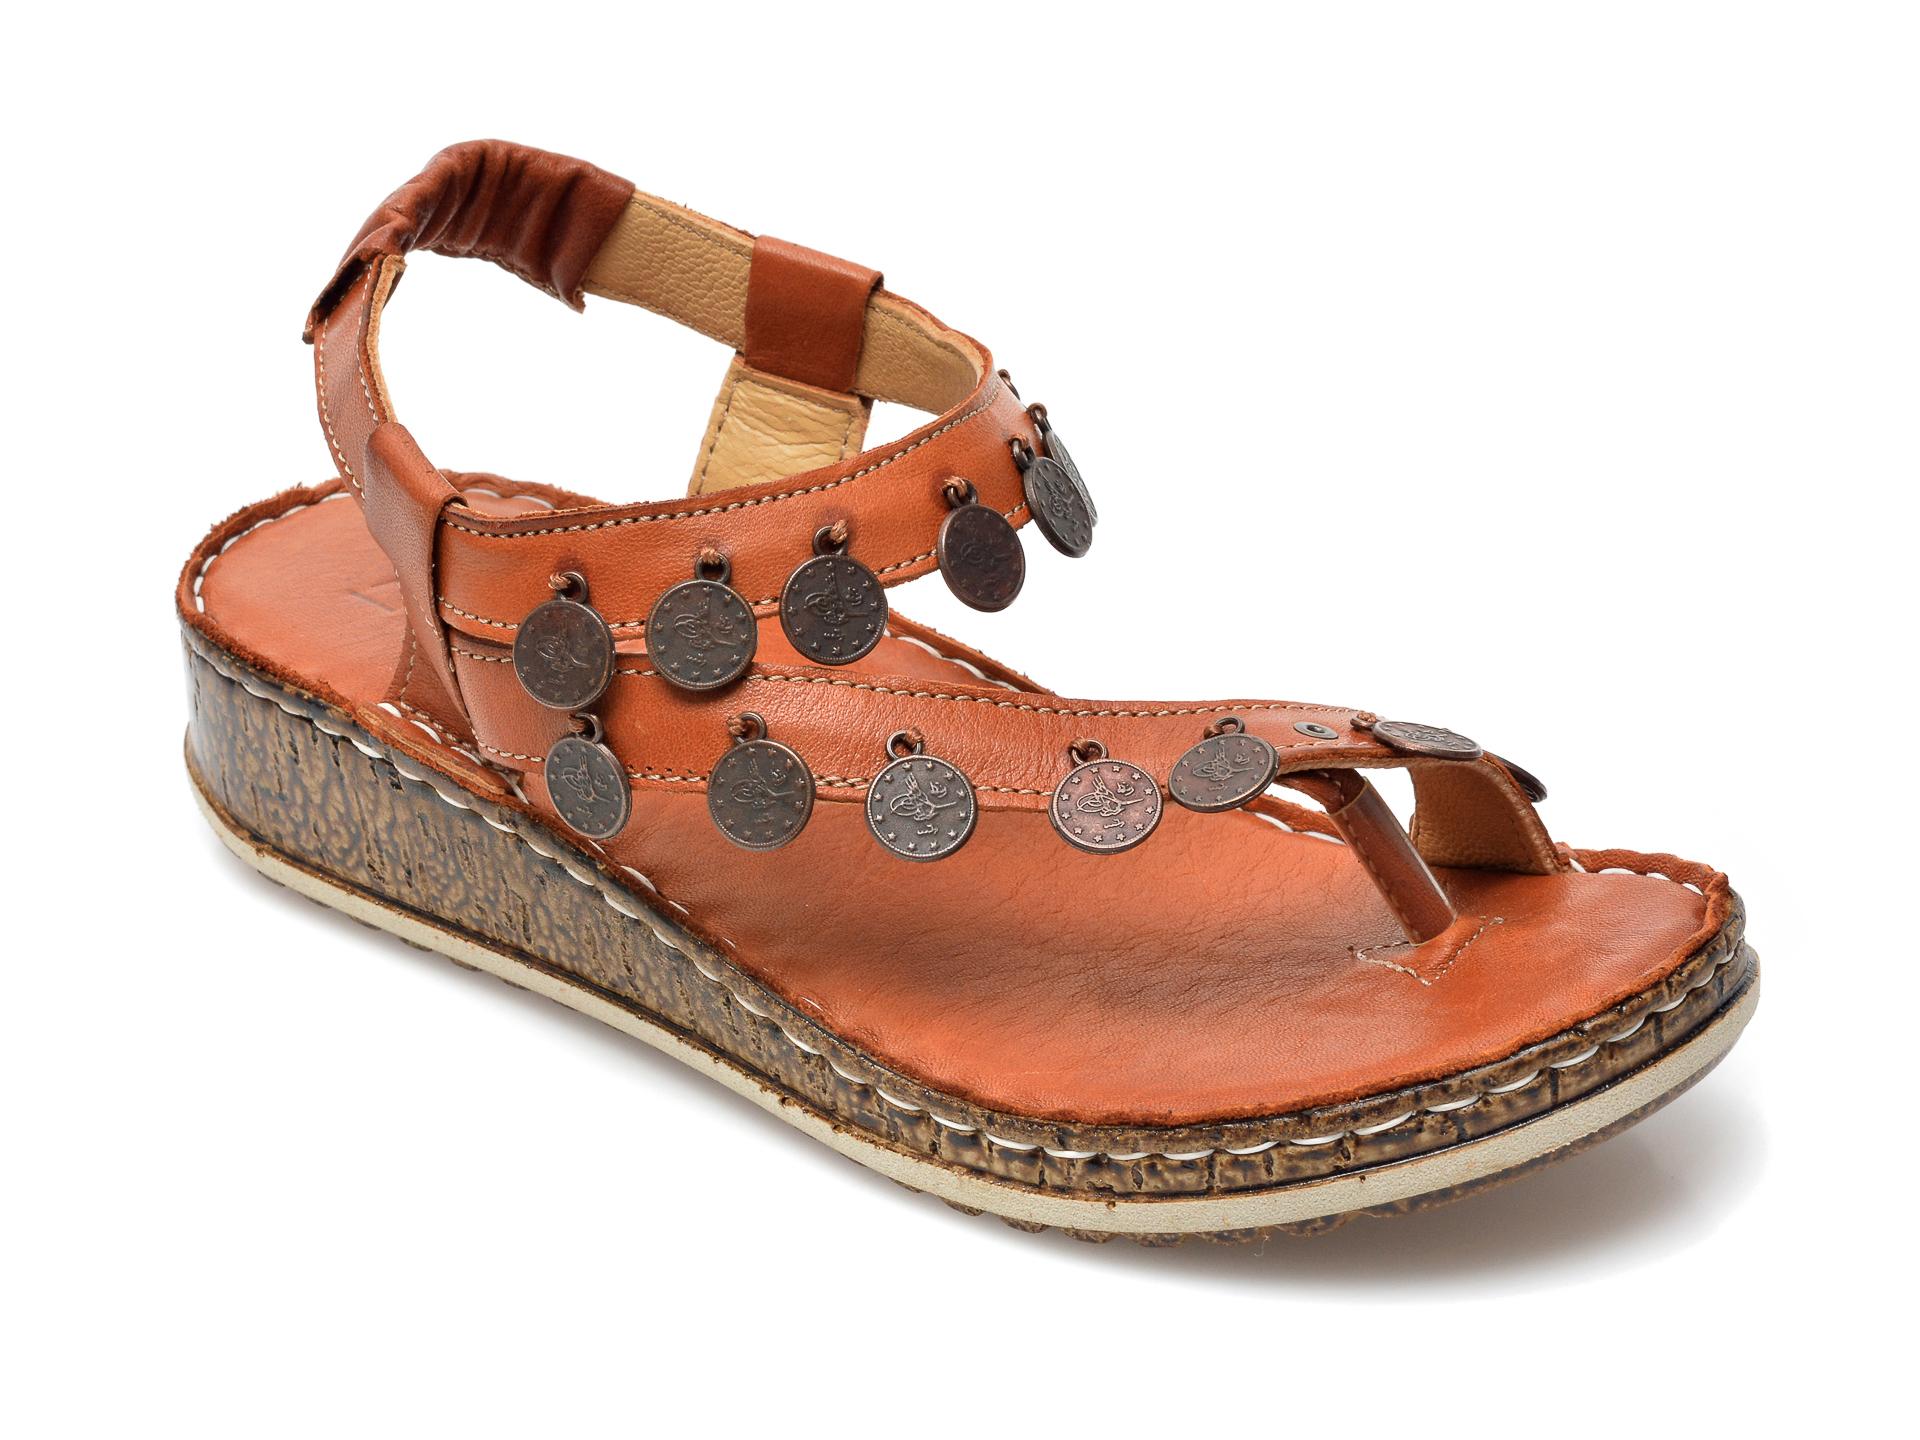 Sandale PAVARELLA maro, 1313, din piele naturala